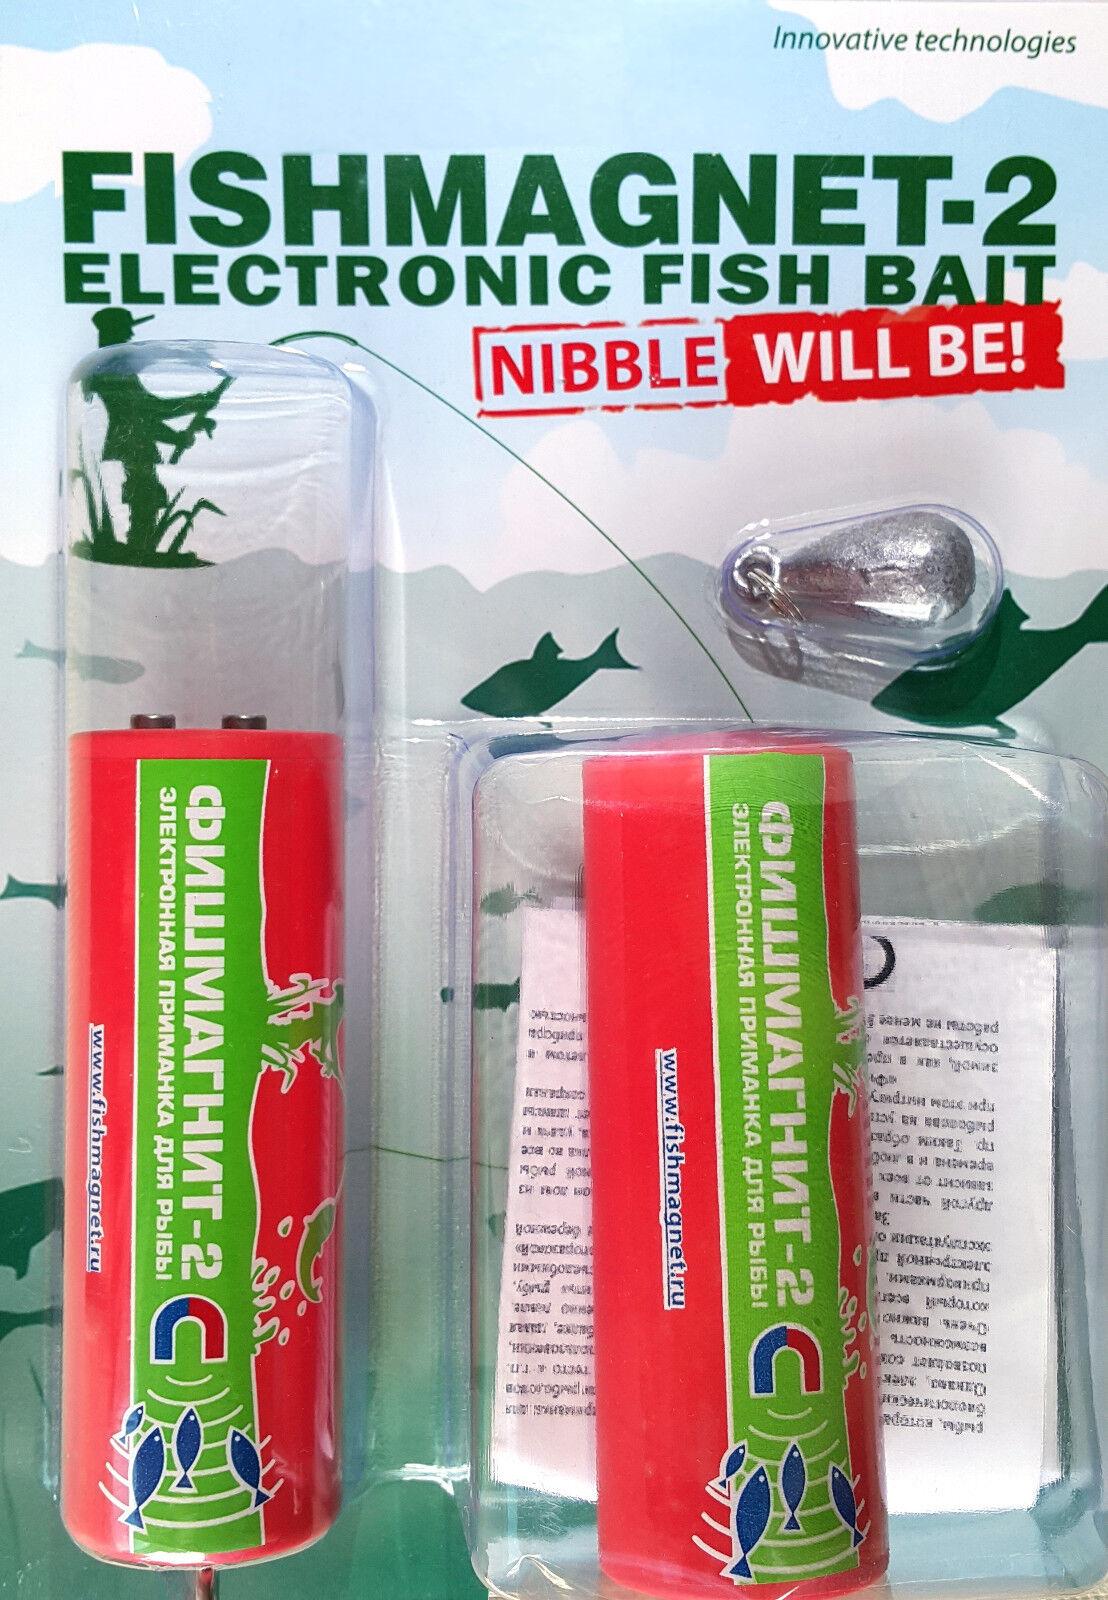 Electronic Fish Bait FishMagnet - 2 Standart-economía - 2x500 peces Atractor